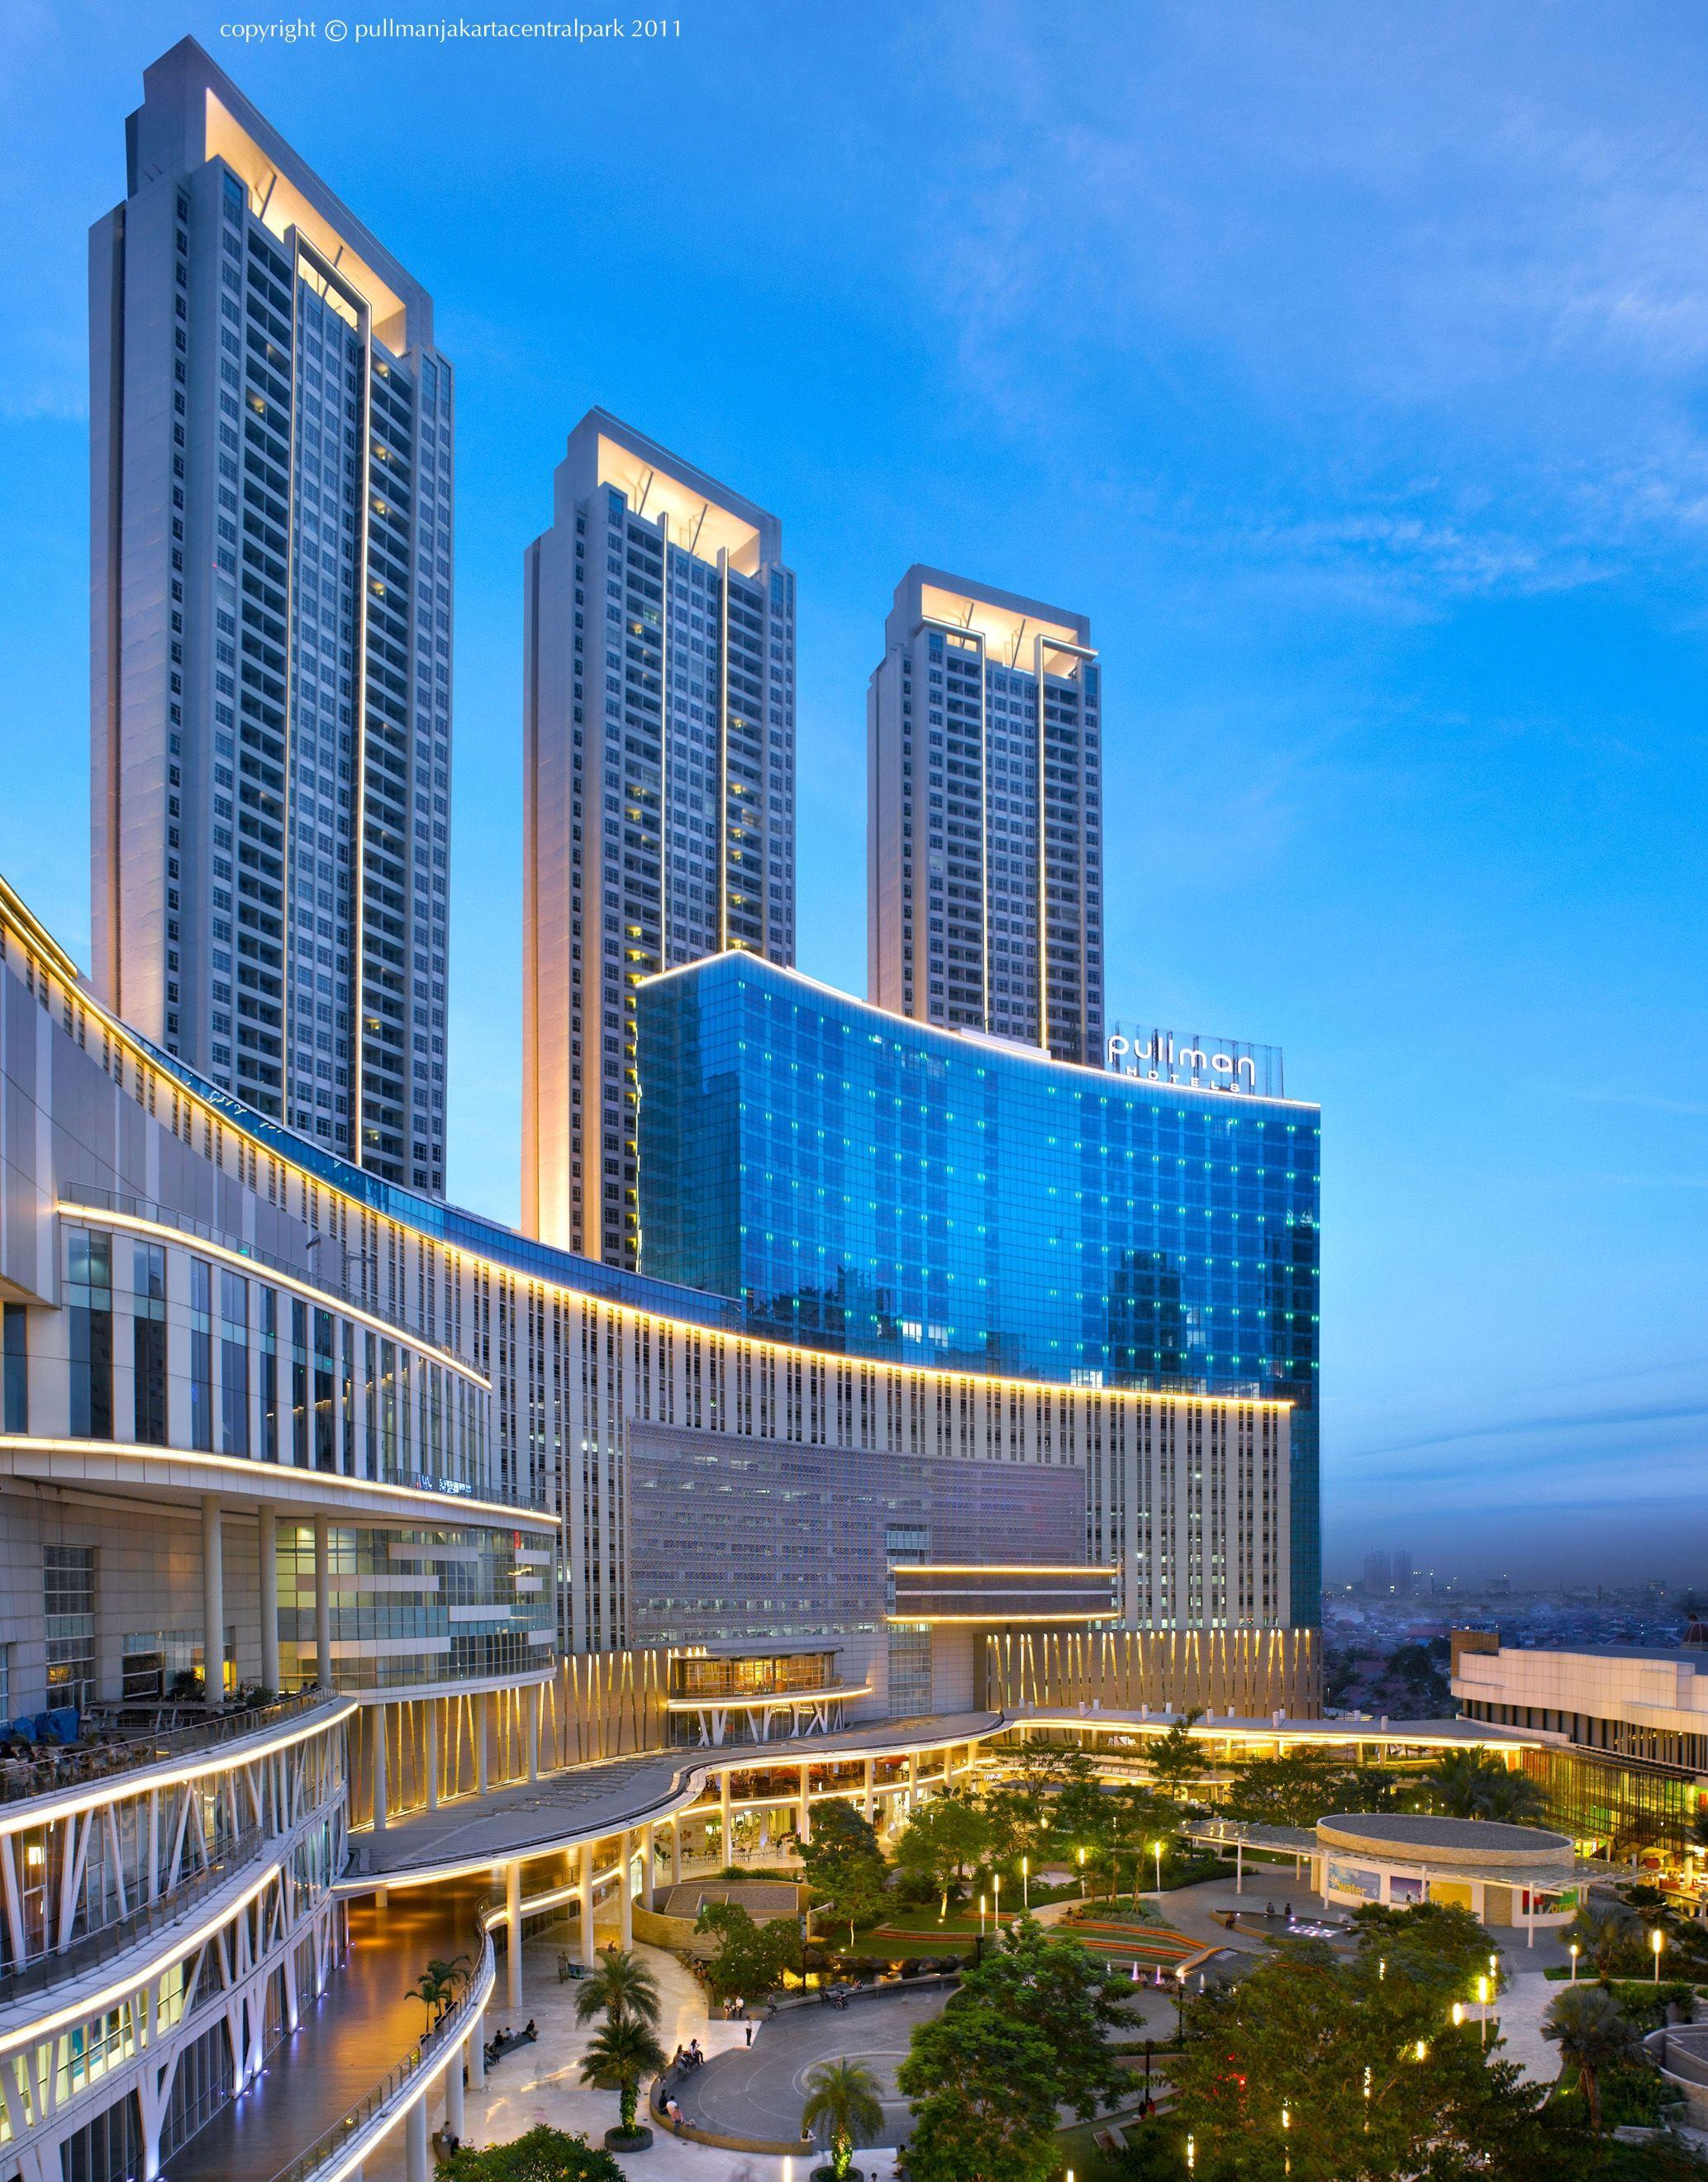 10 Gedung Tertinggi Di Jakarta Kaskus The Largest